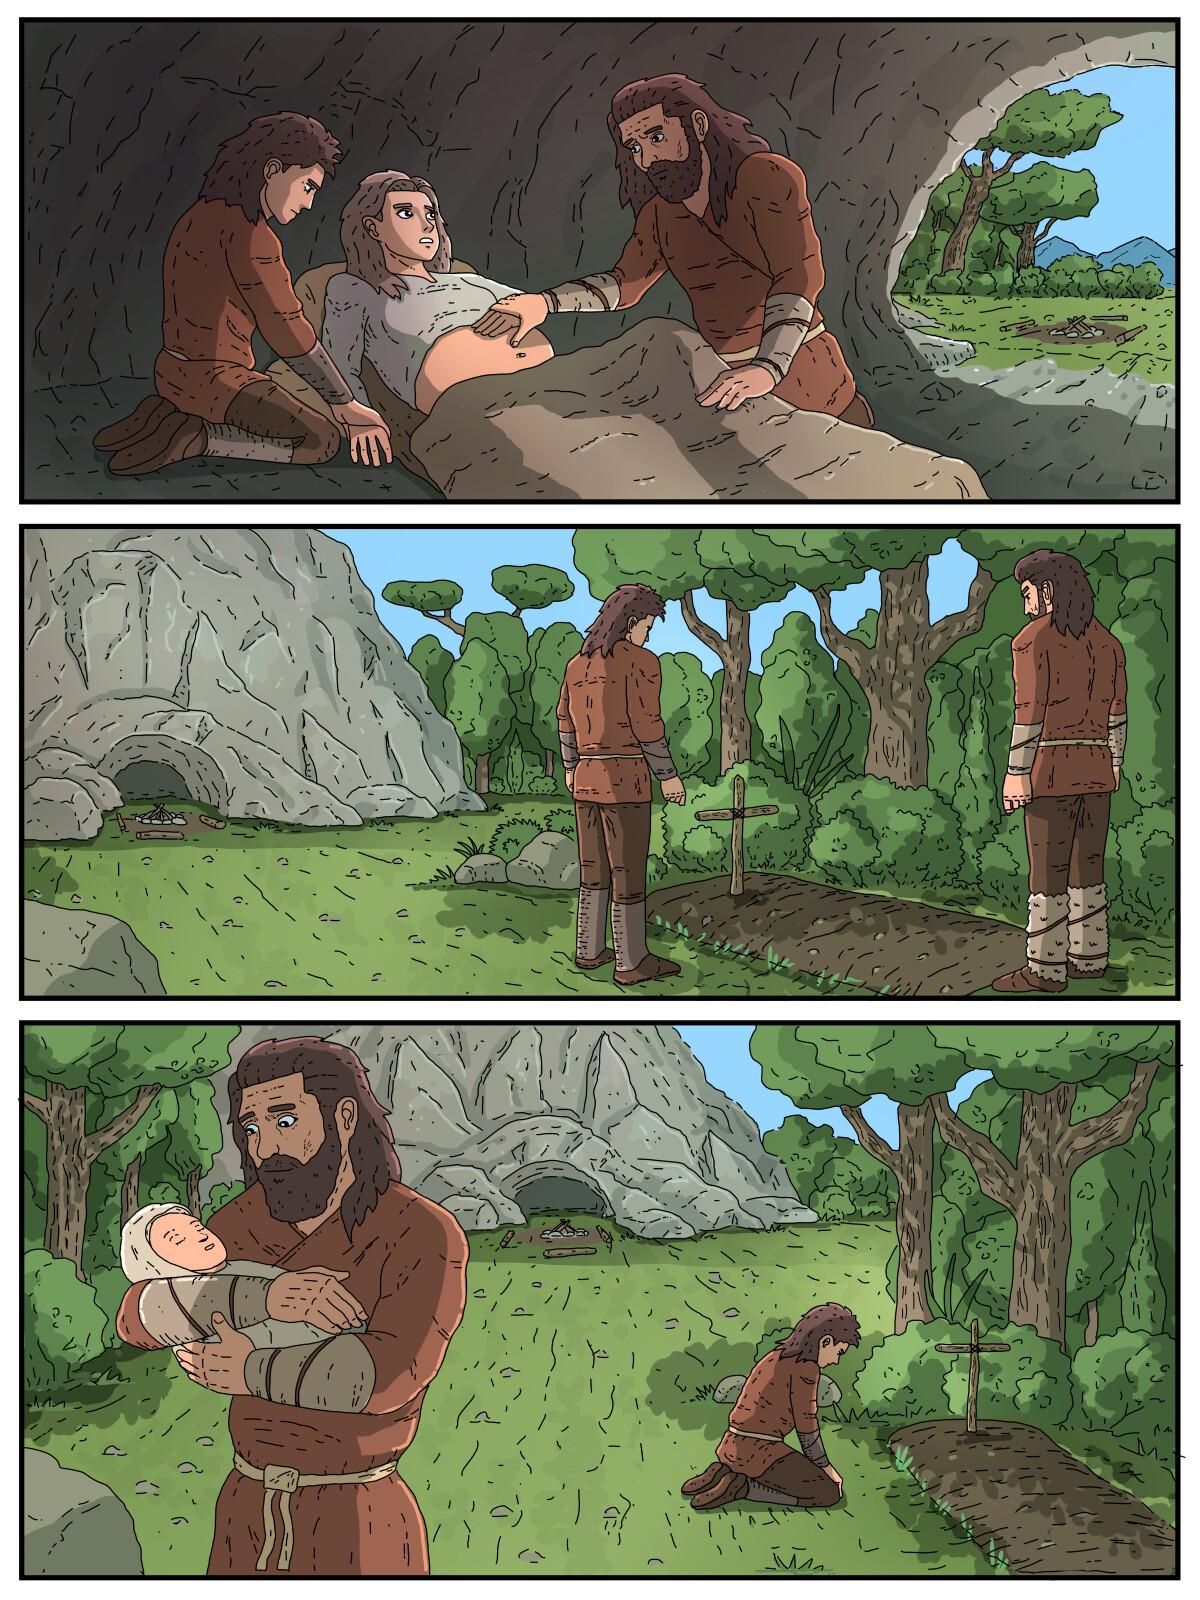 Illustration for comic book